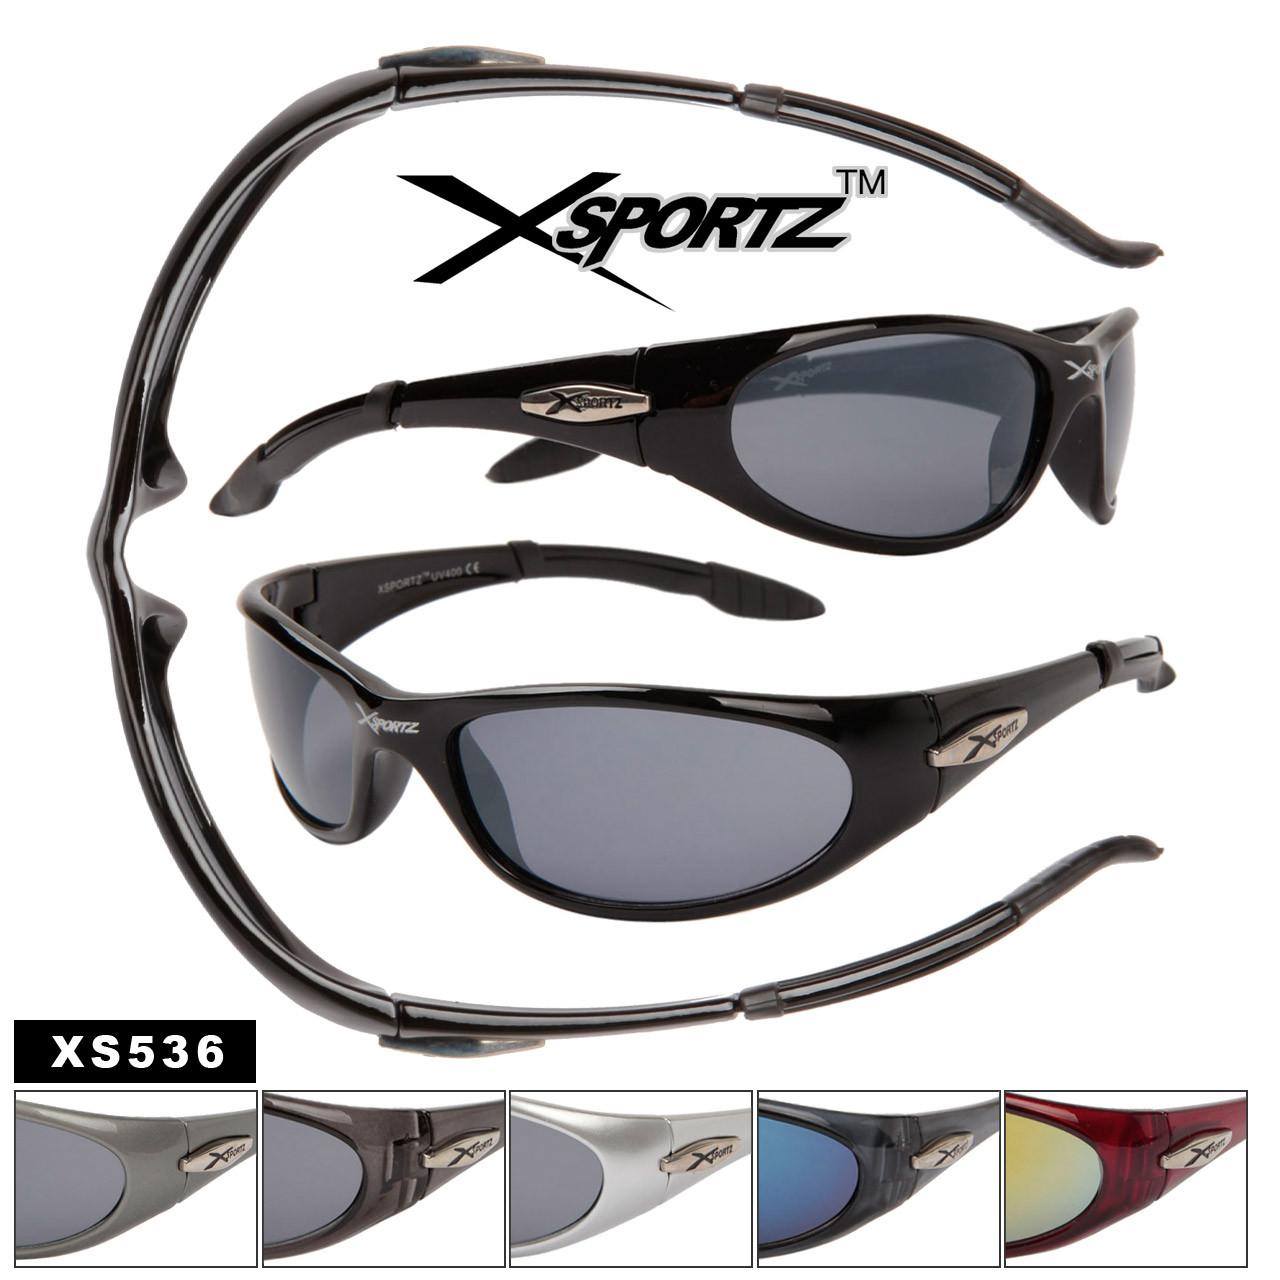 XS536 Xsportz Wholesale Sunglasses great style for men